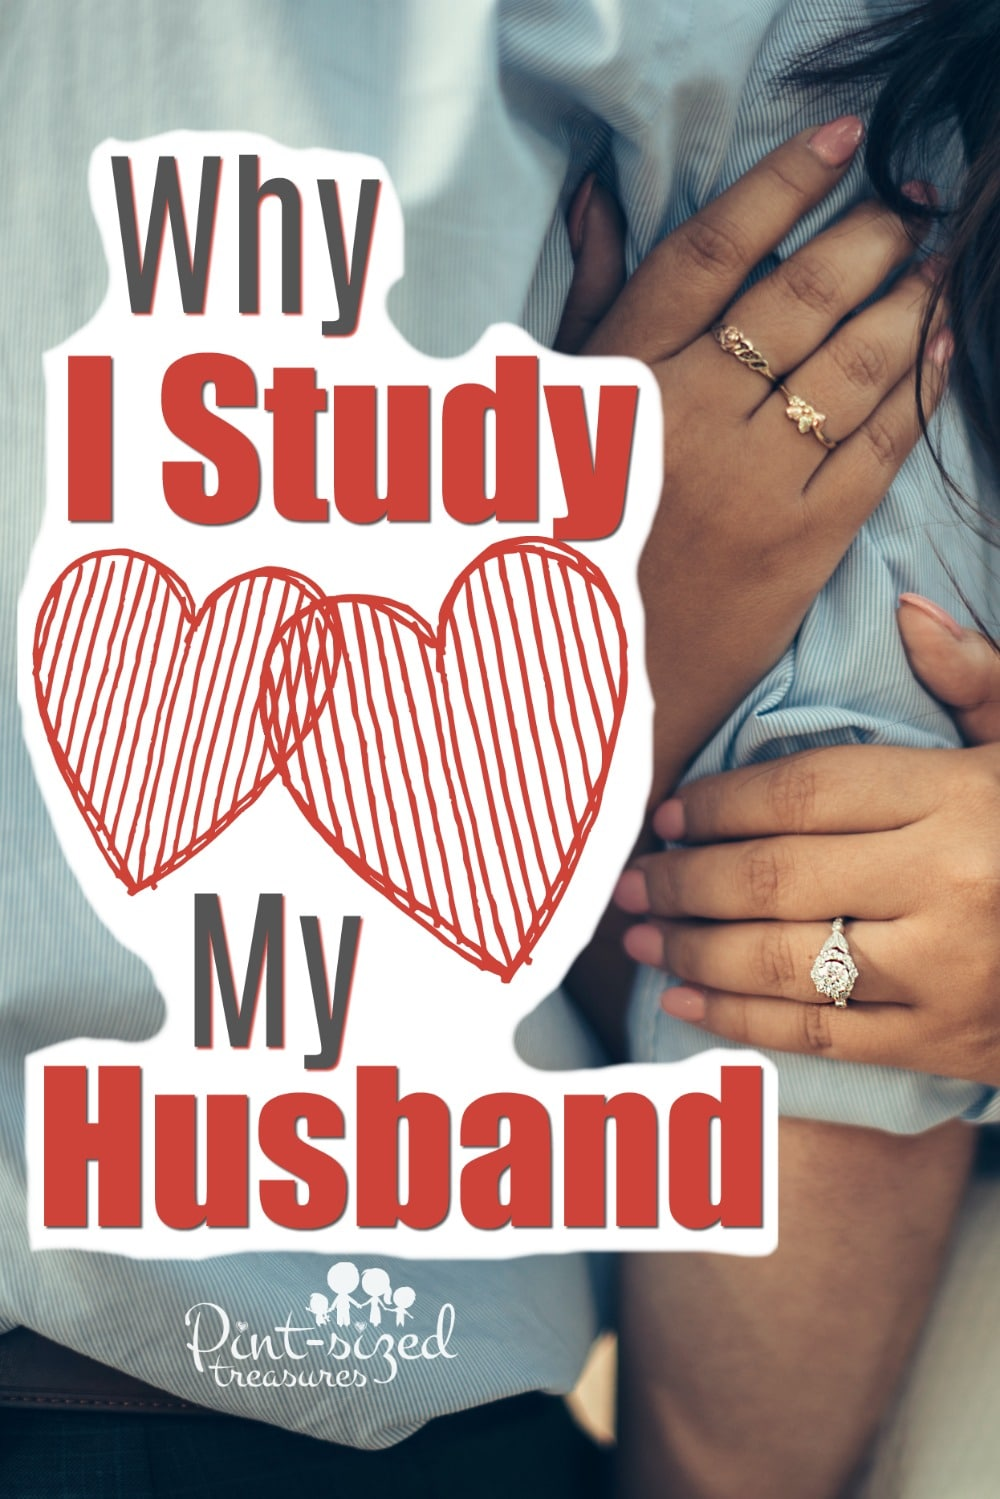 Why I choose to study my husband